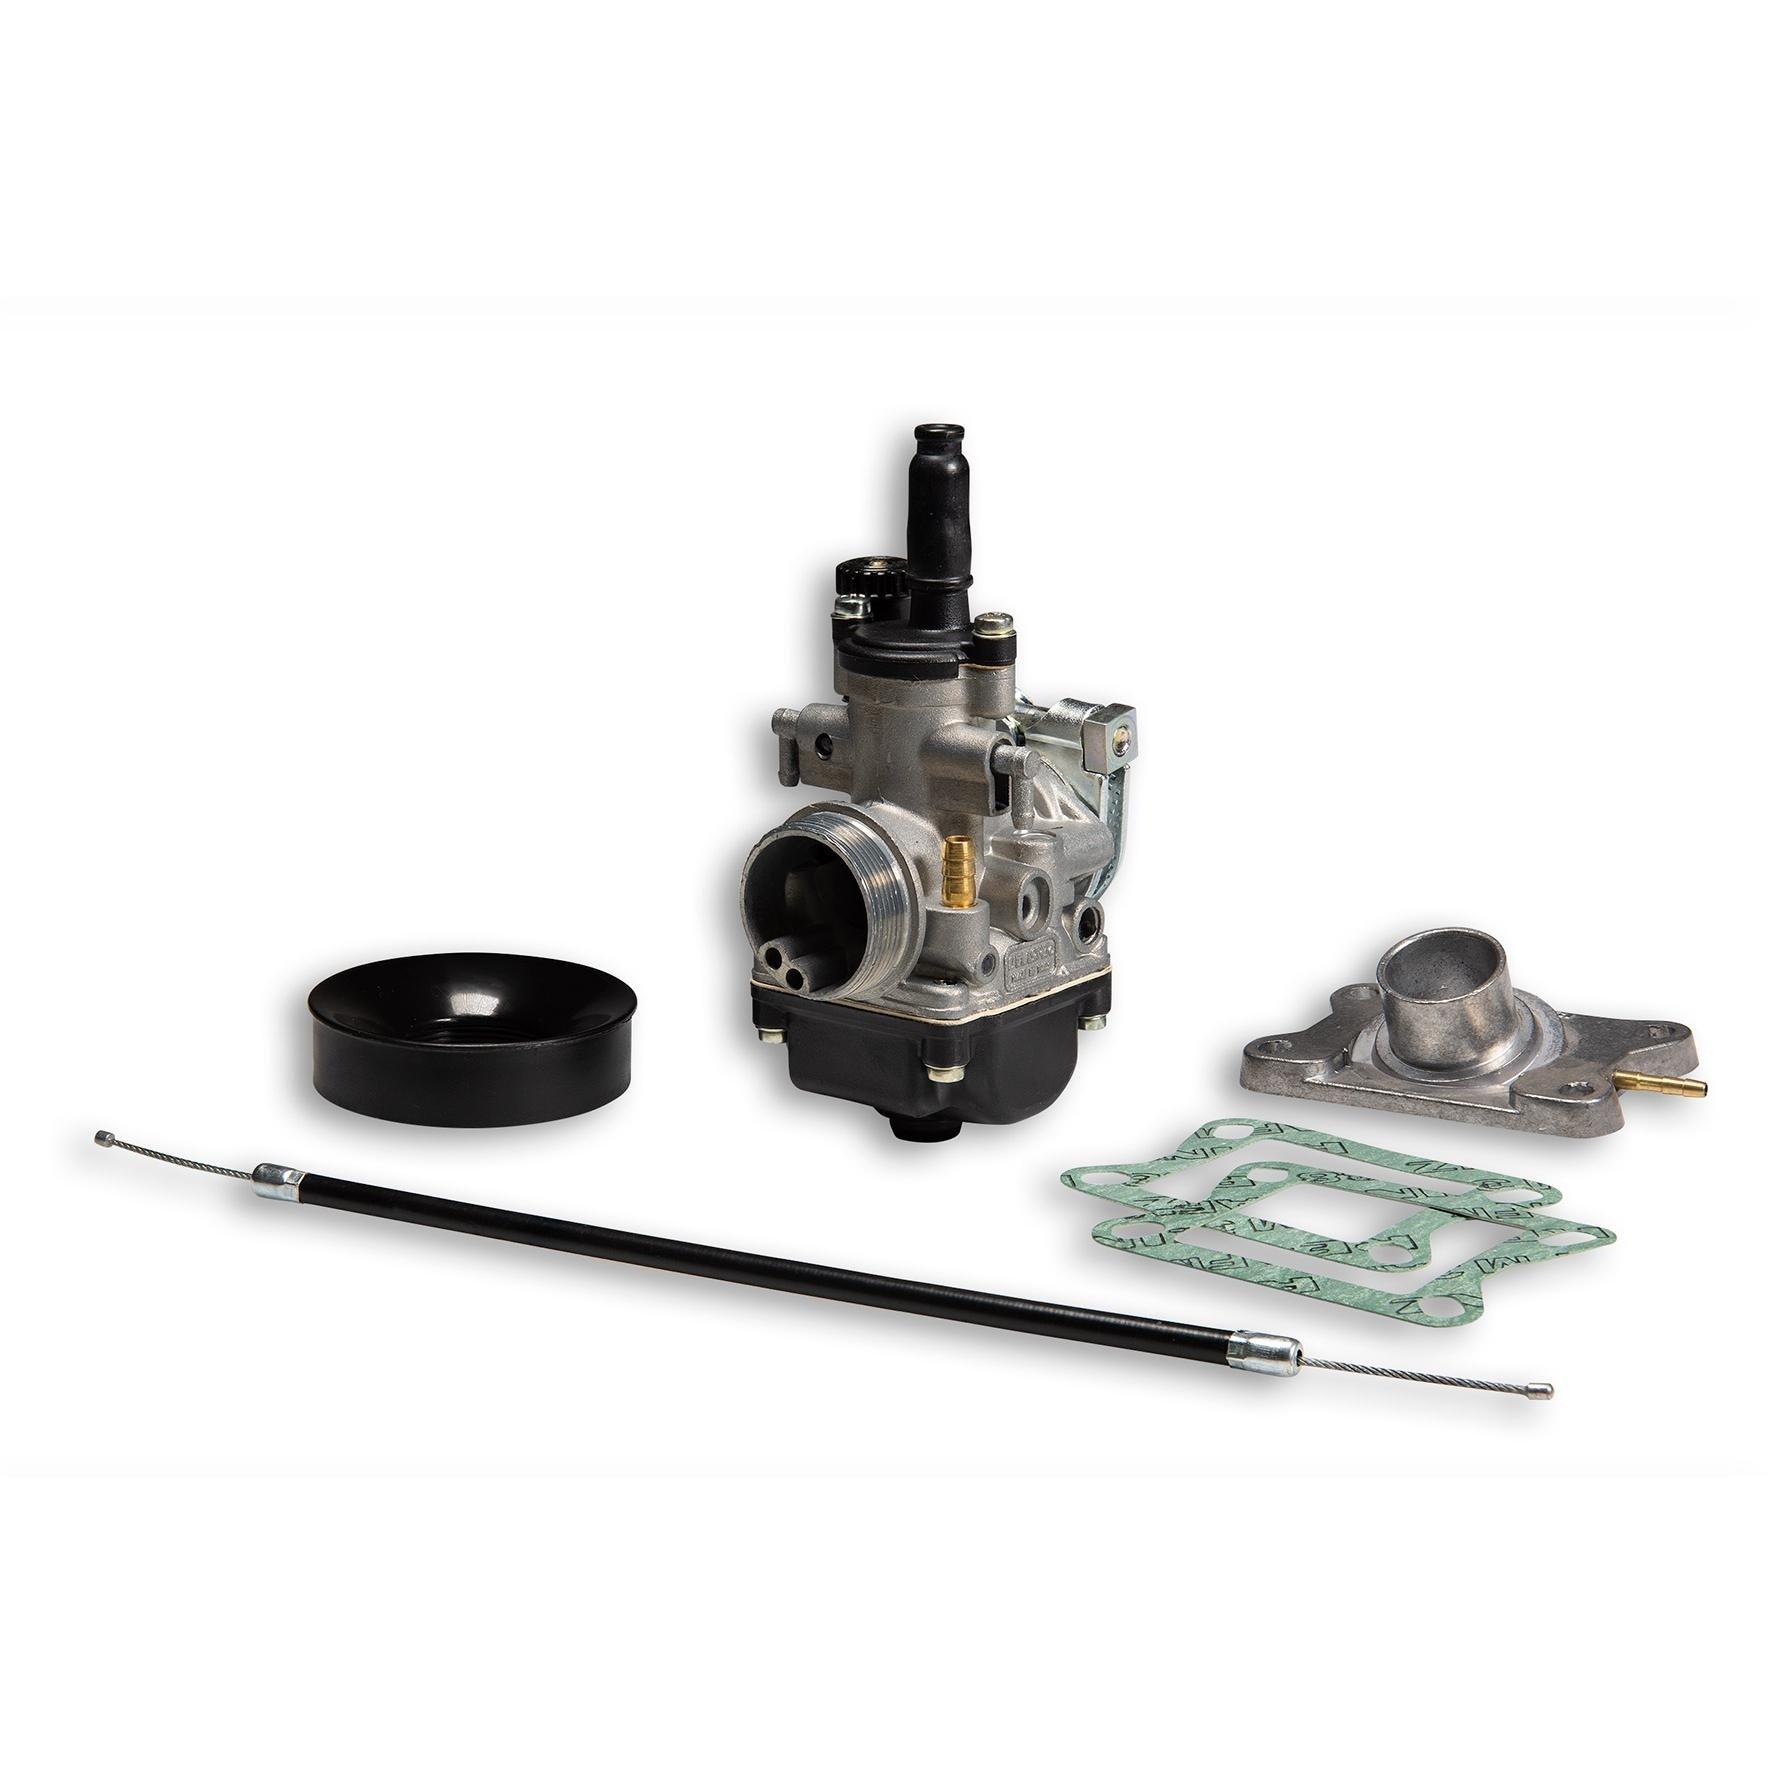 Kit carburateur Malossi PHBG 21 A Aprilia 50